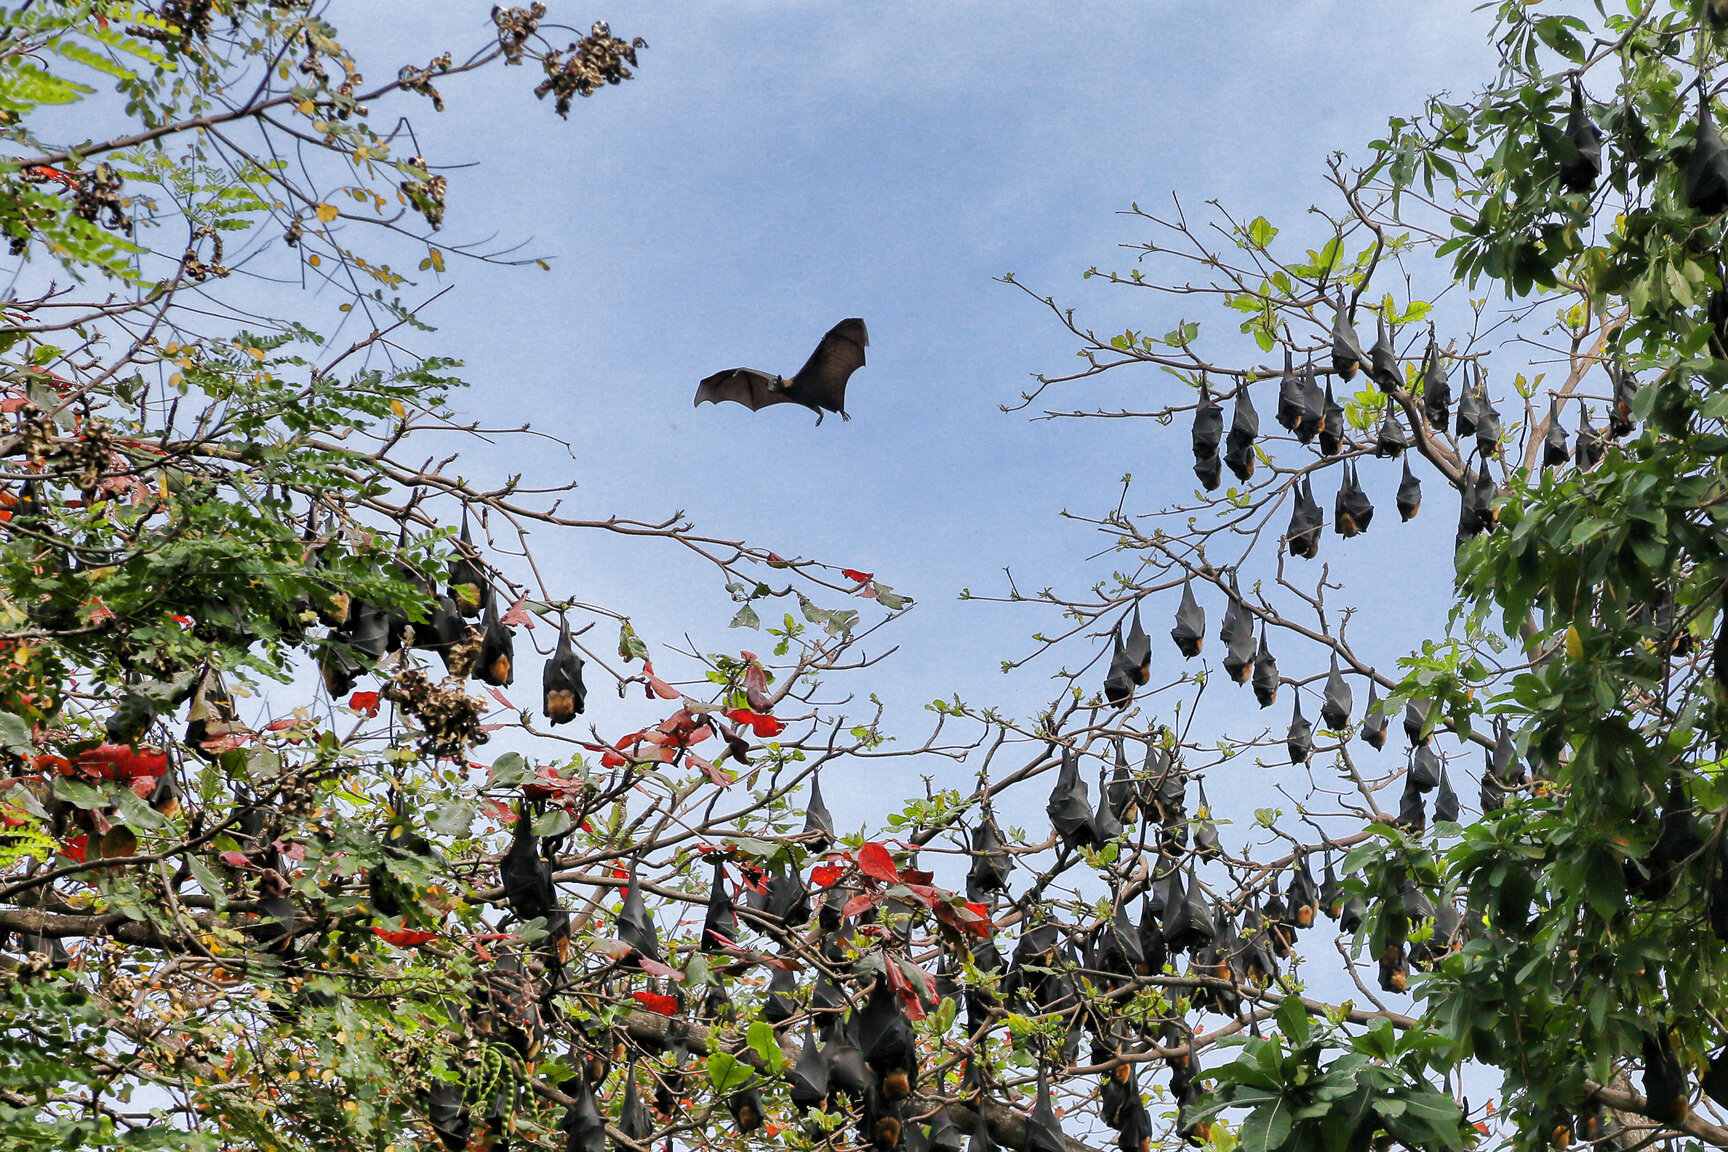 Flying foxes (fruit bats).